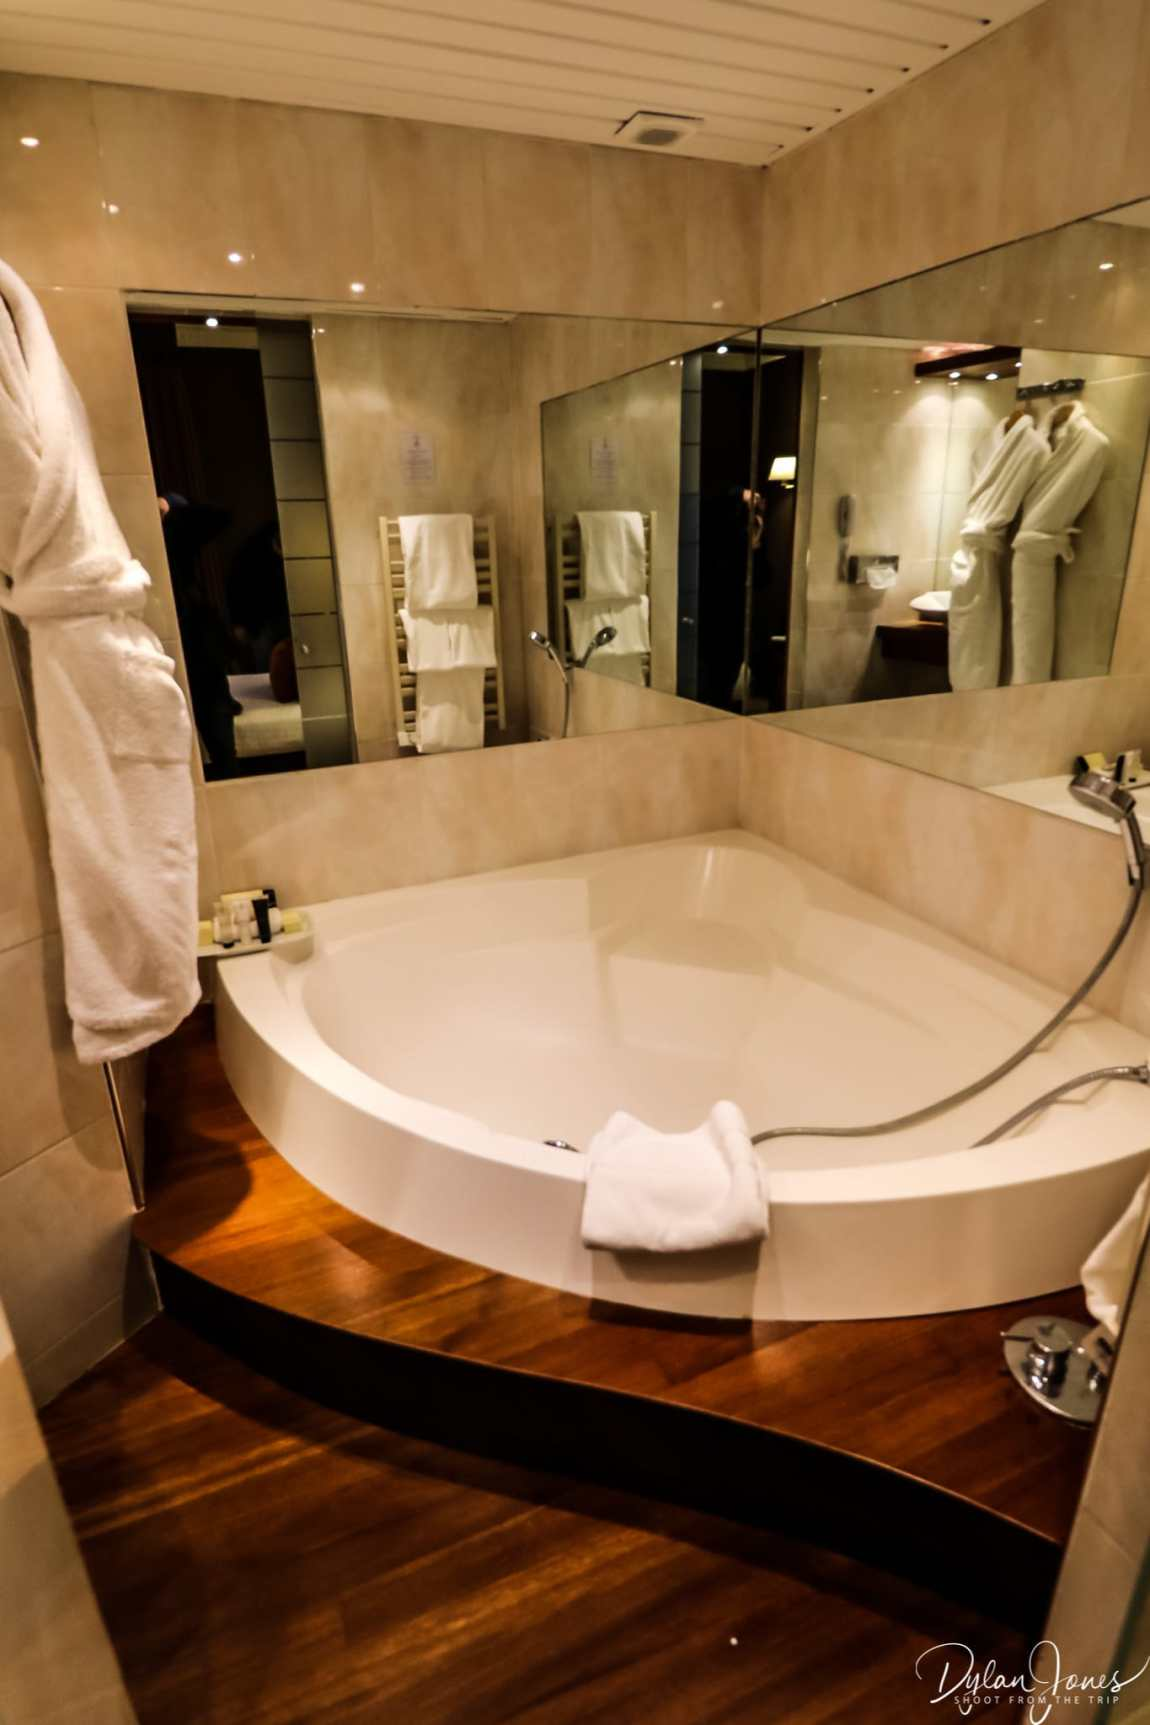 Bathroom at the Hotel Carlton Lille